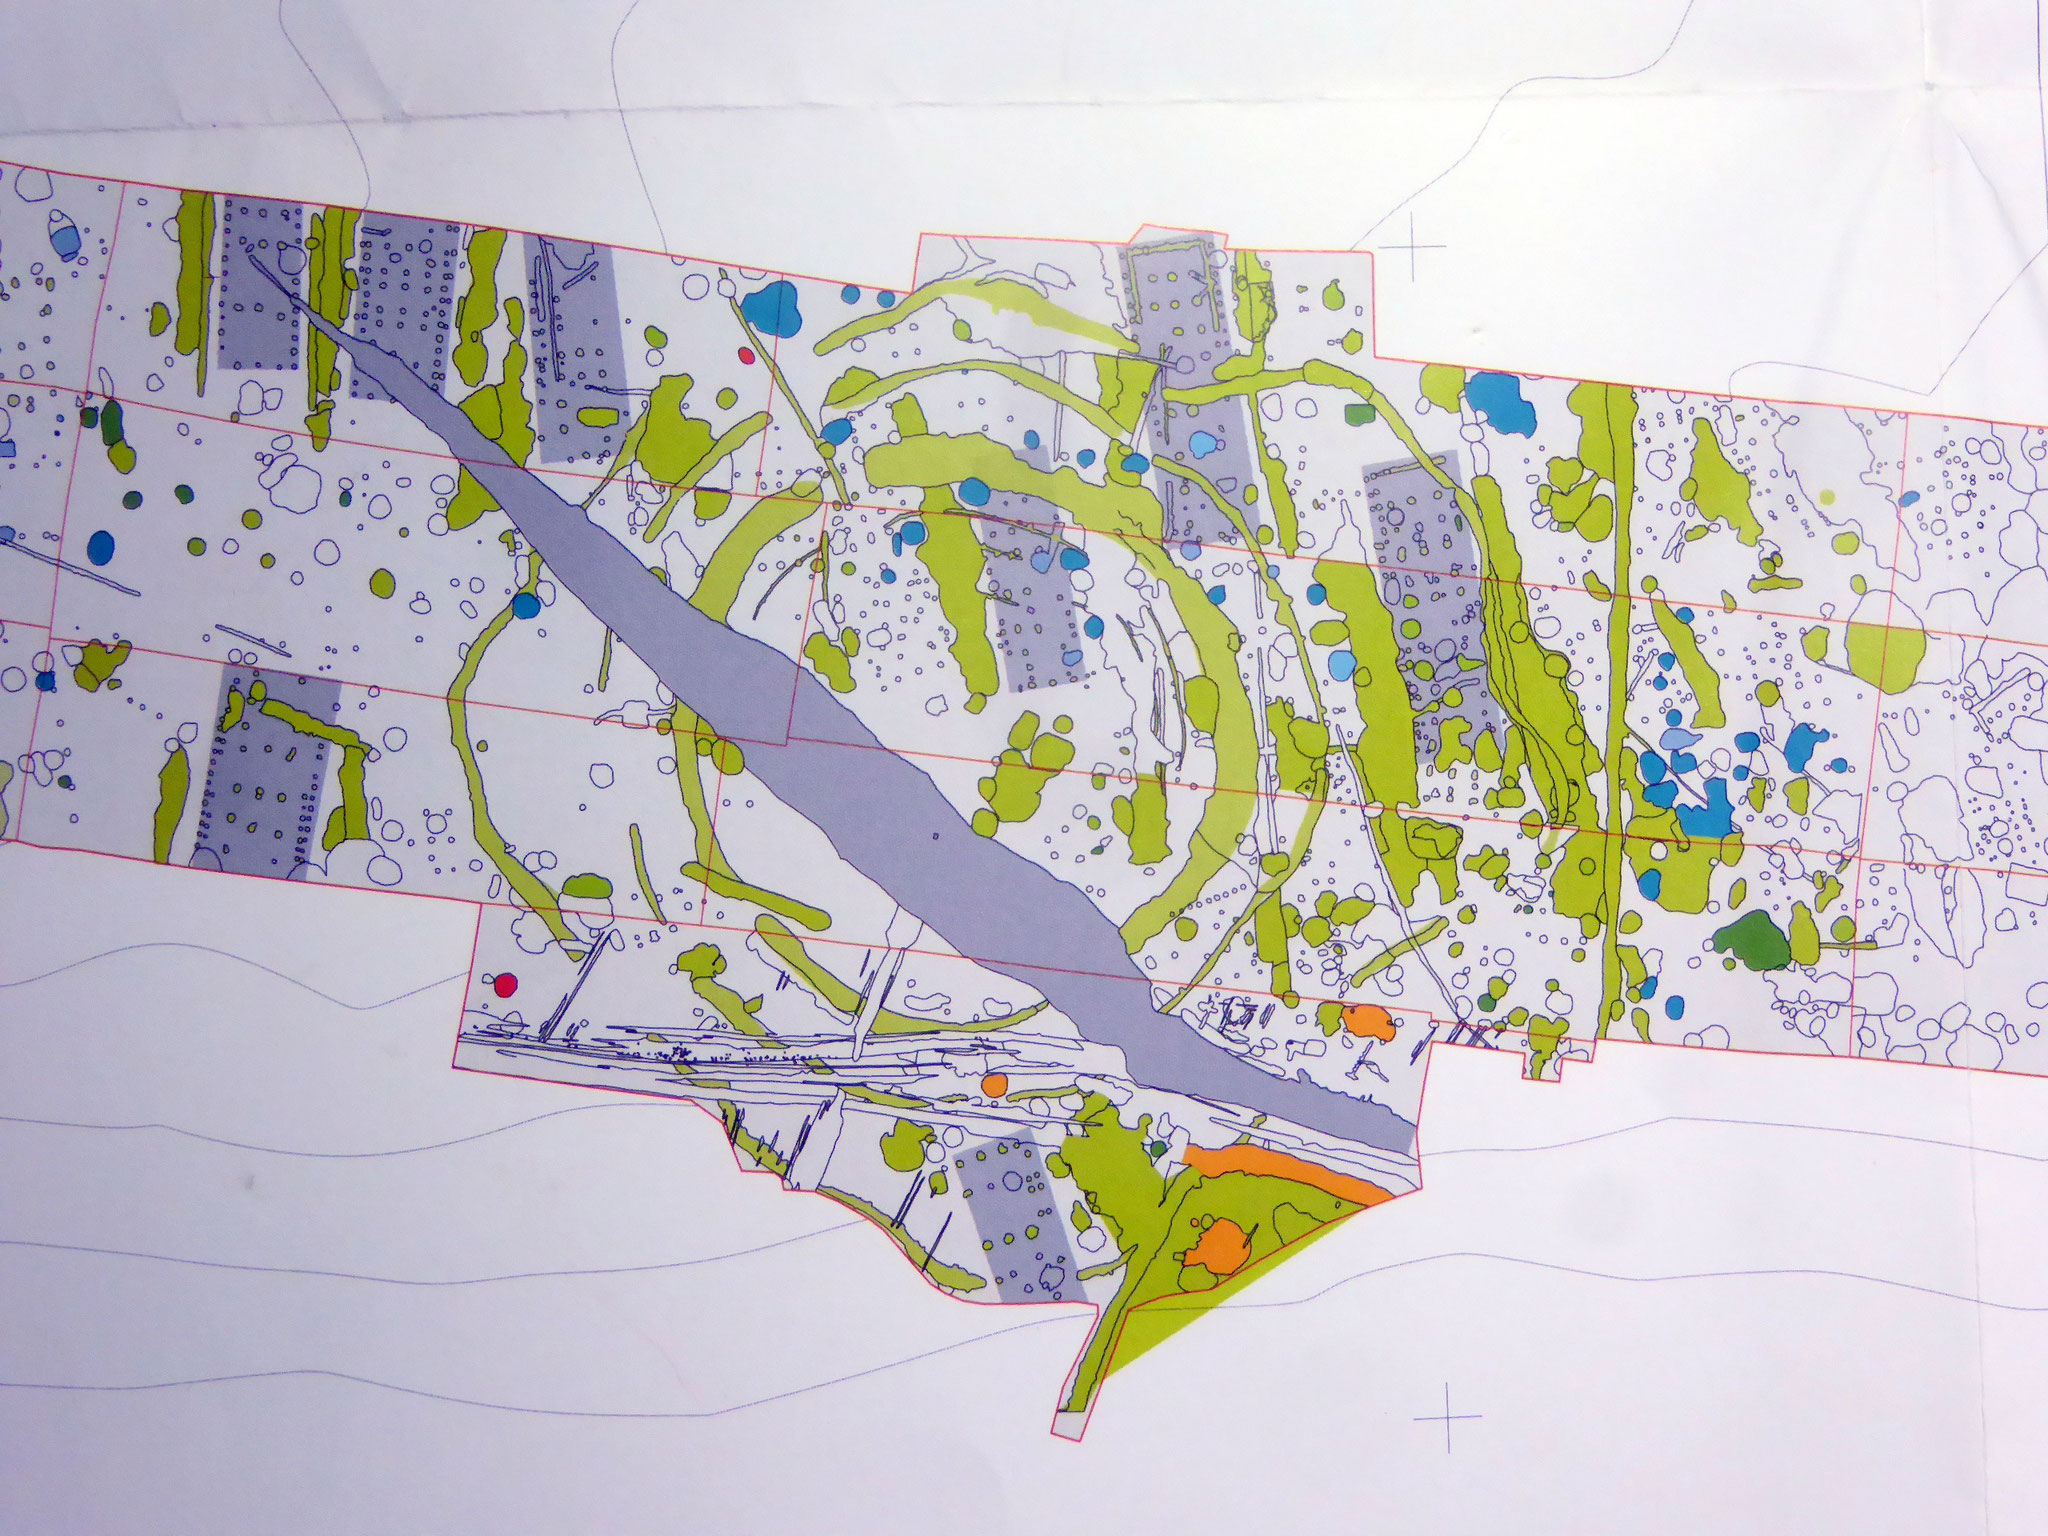 Bild der Bodenprospektion (Foto wurde v. Frau Michel M.A., FU Berlin z.Verfügung gestellt)